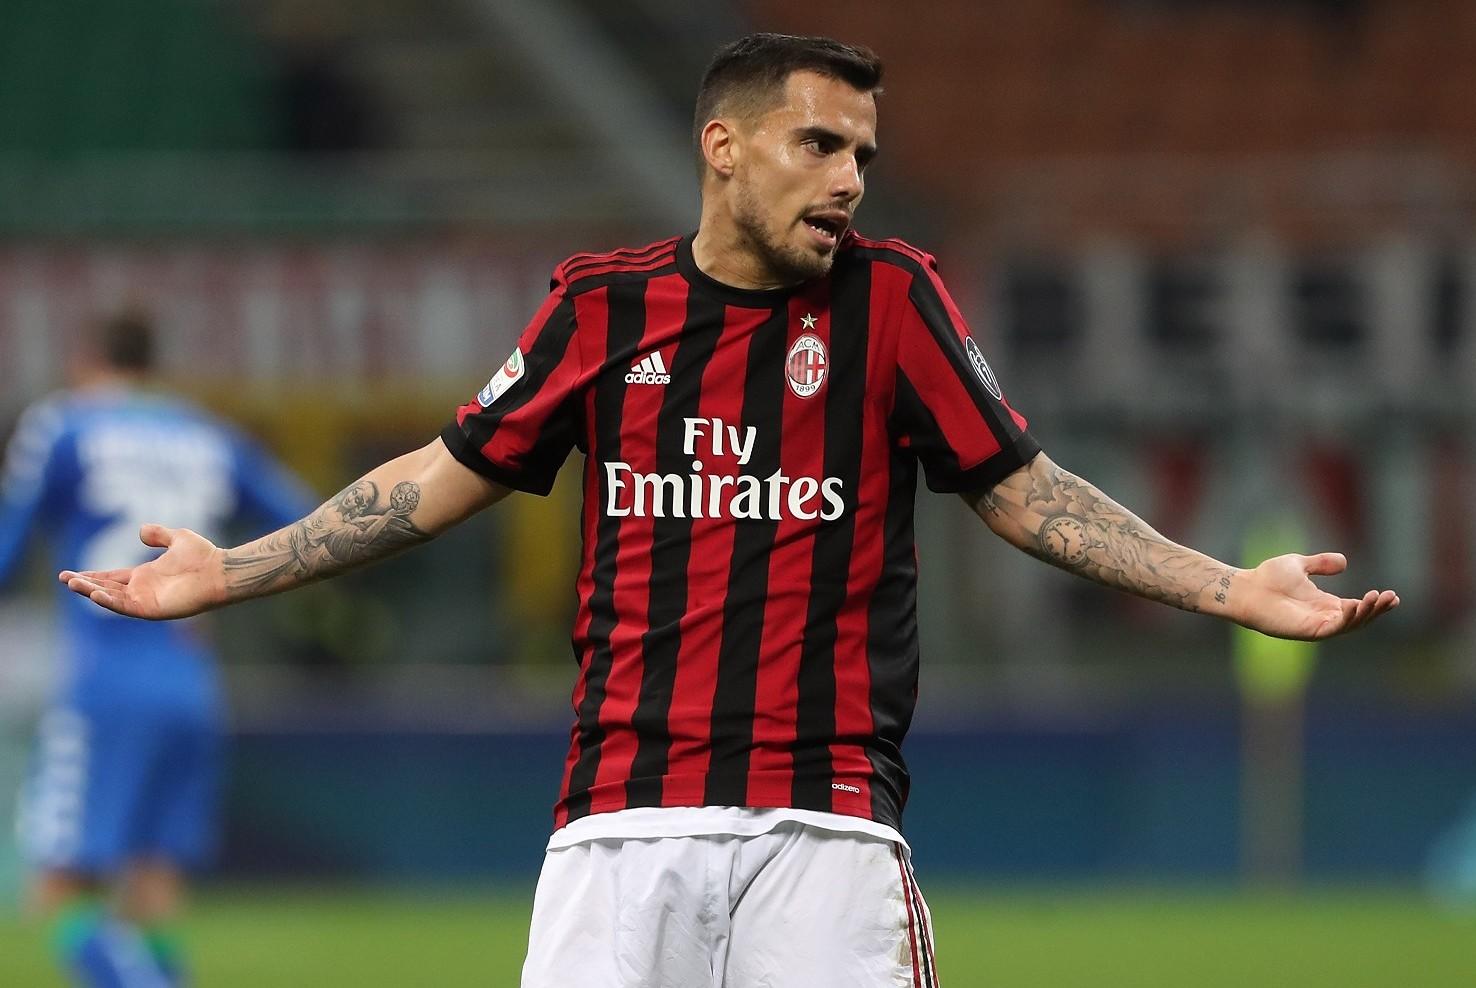 Lazio Milan streaming gratis adesso. Dov